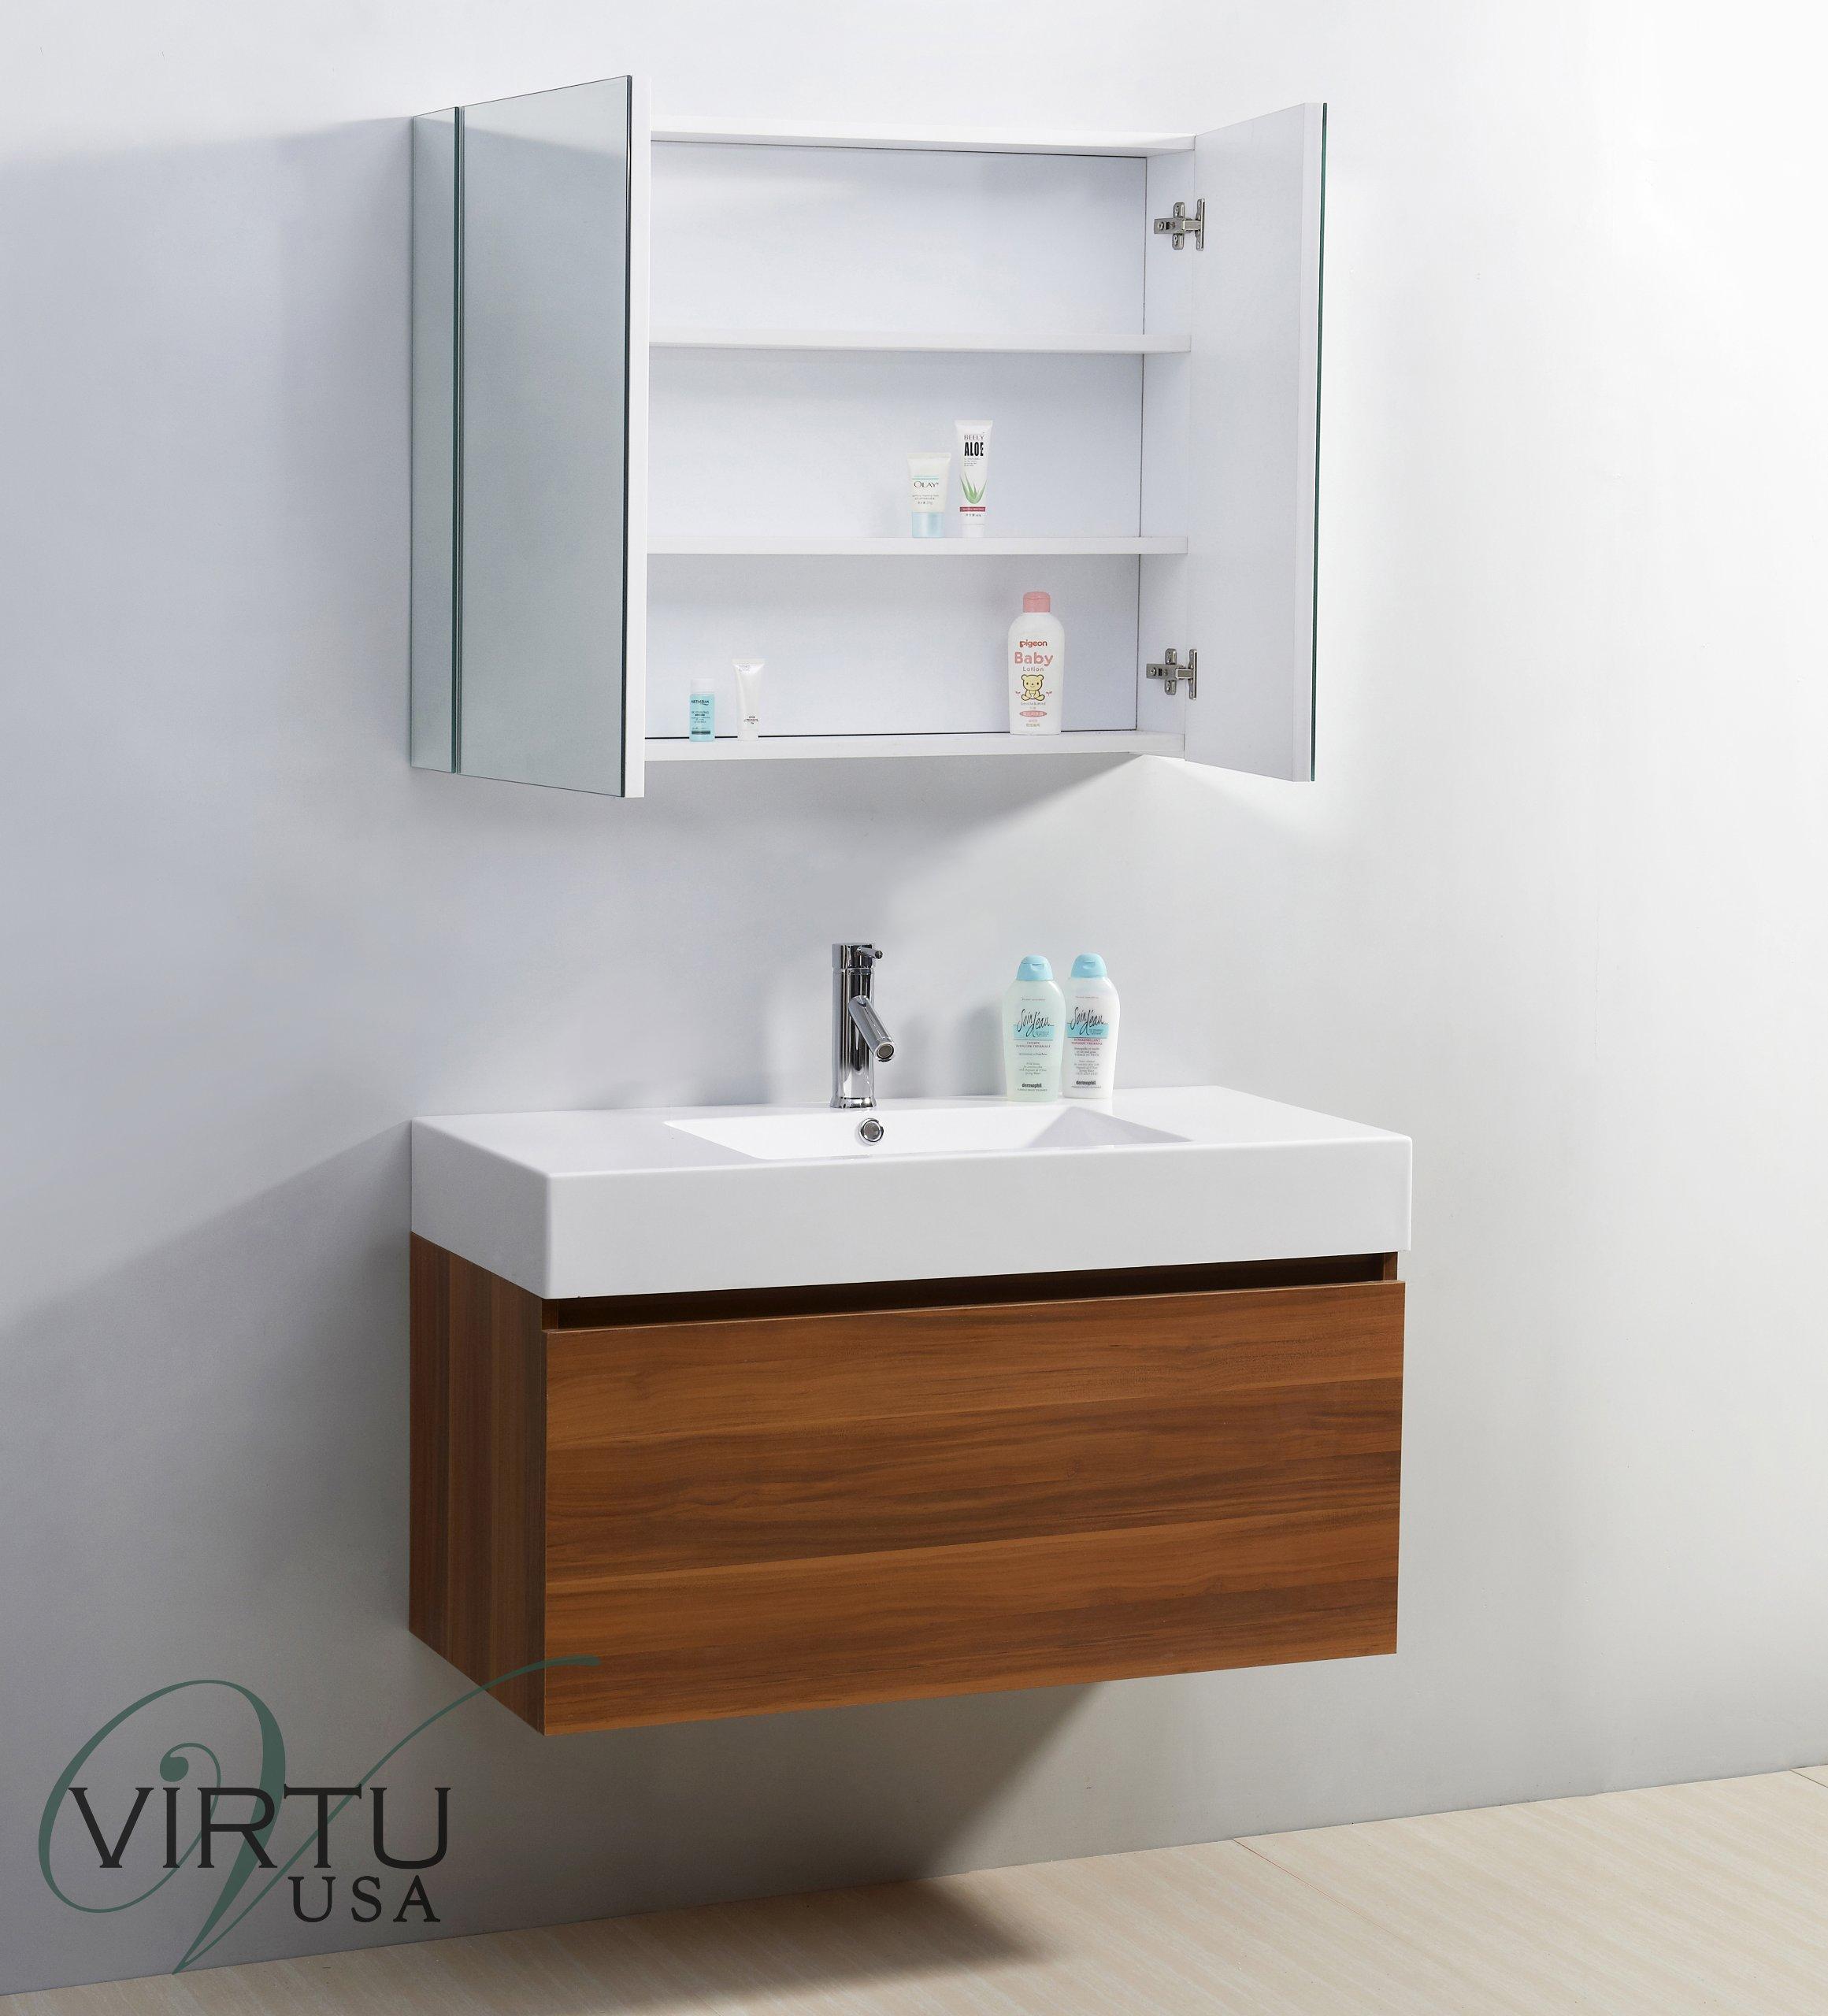 Virtu USA JS-50339-PL 39-Inch Zuri Single Sink Bathroom Vanity, Plum